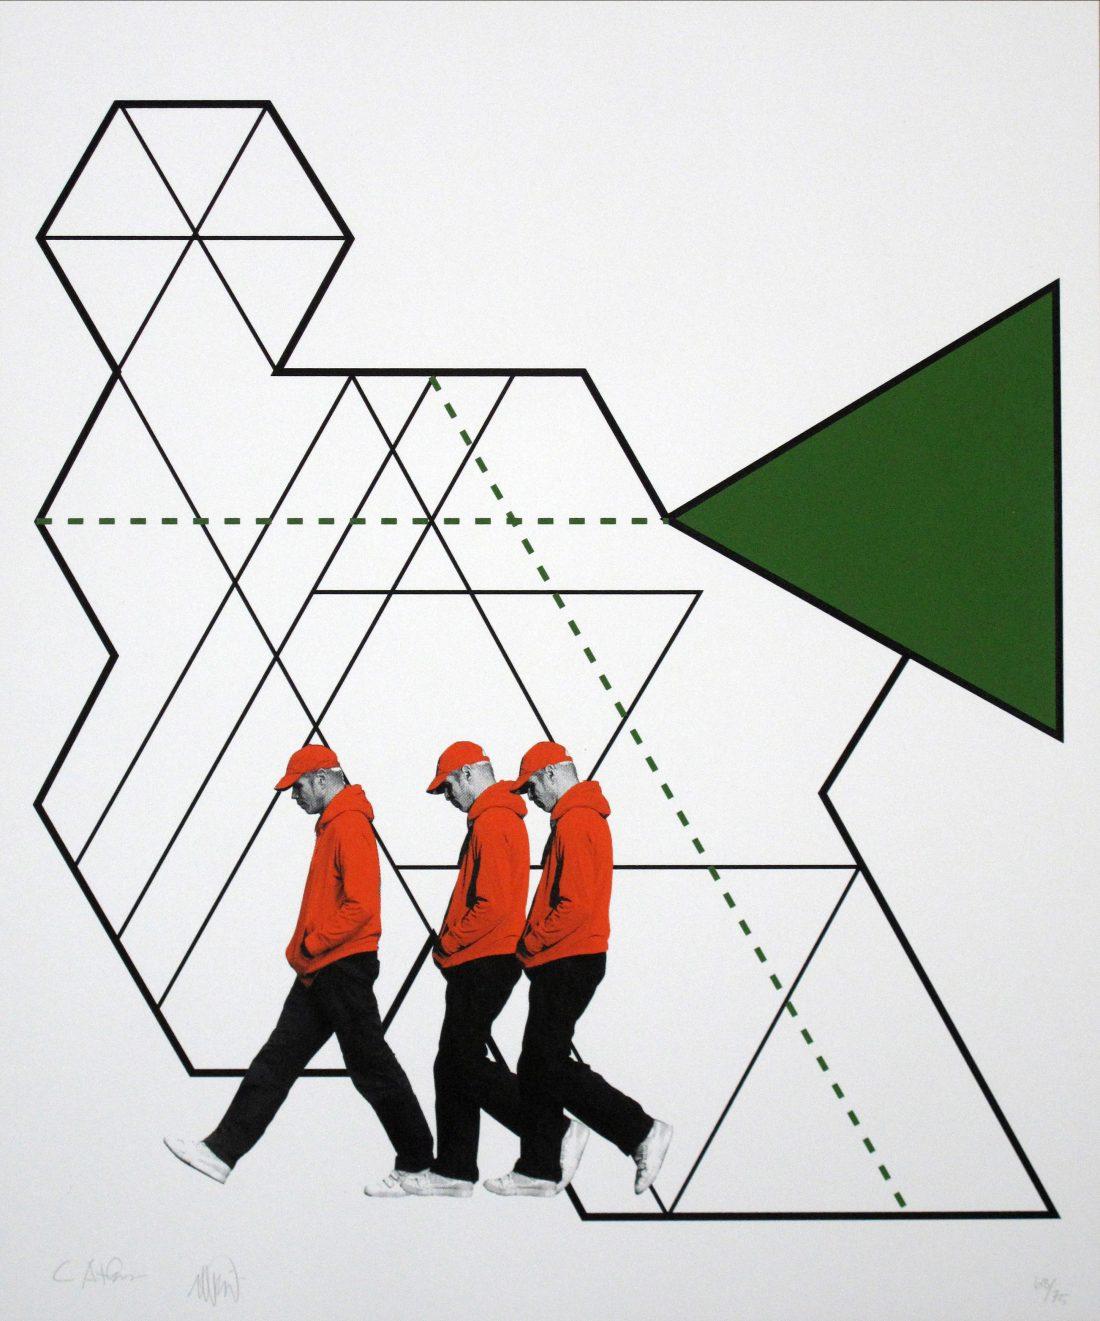 Charles Atlas & Mika Tajima – Untitled, 2011